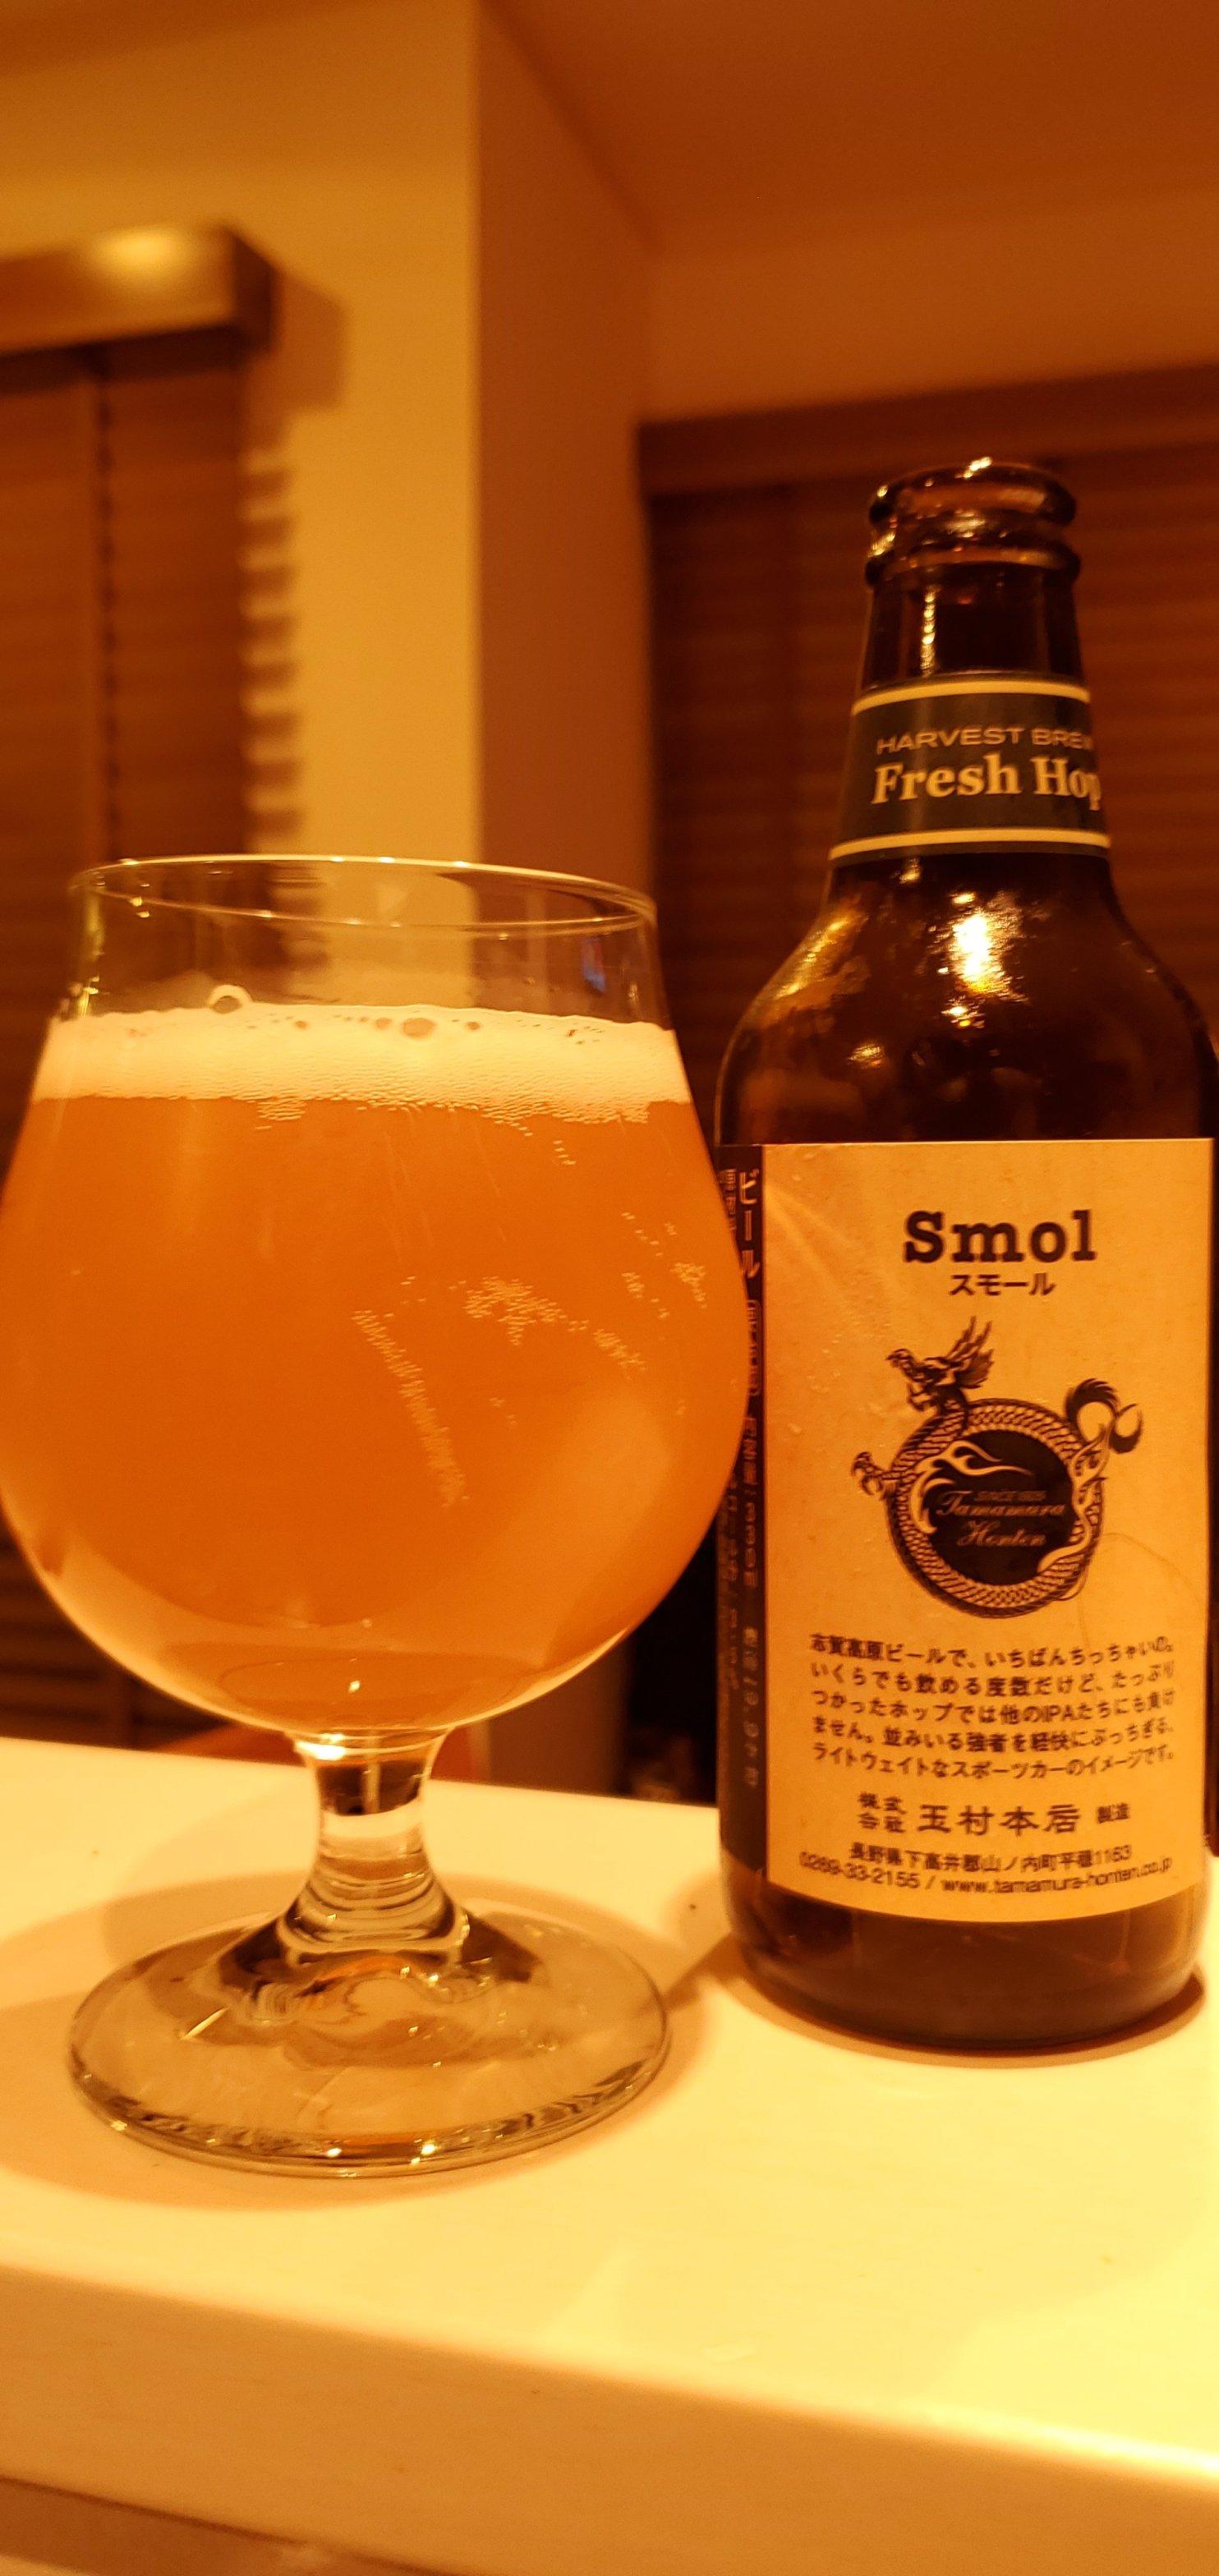 Shiga Kogen Harvest Brew Smol・志賀高原ハーベストスモール